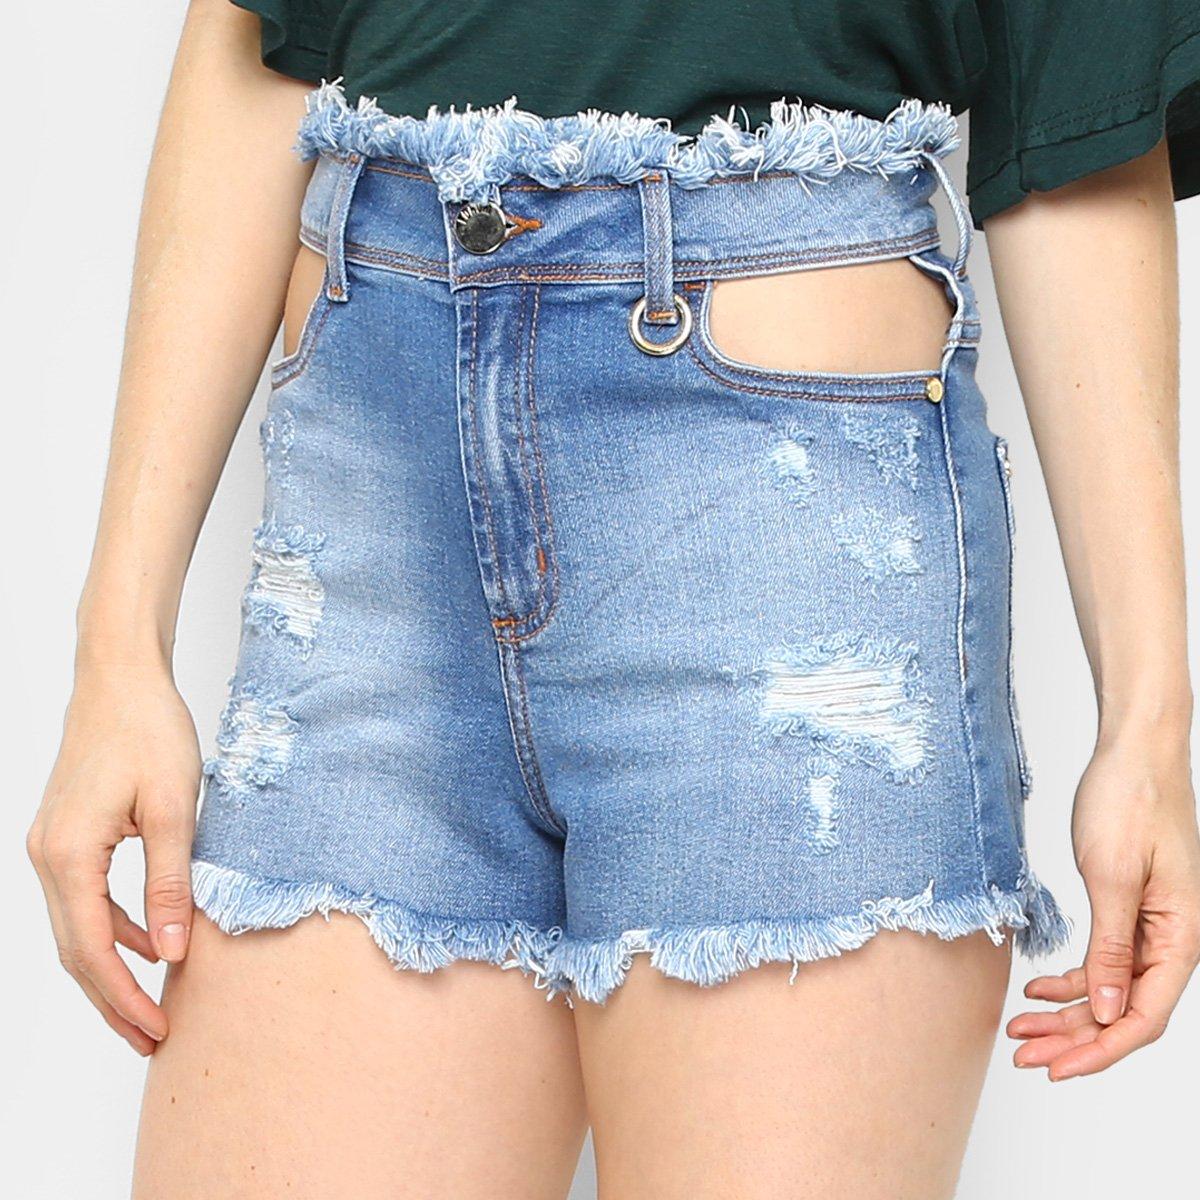 778f0eab6 Short jeans forum estonada barra desfiada feminino azul compre jpg 544x544  Short jeans barra desfiada